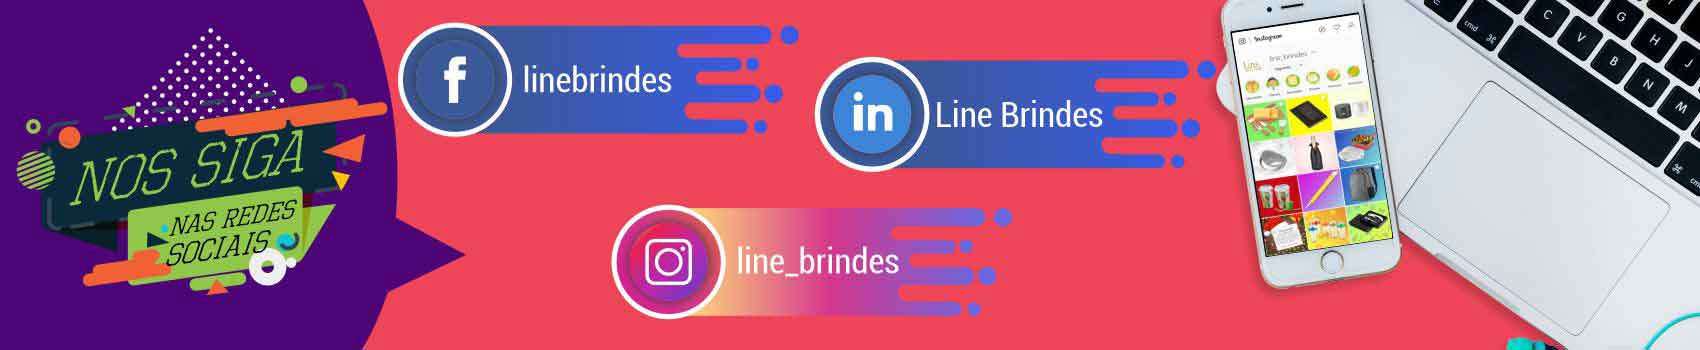 Line Brindes